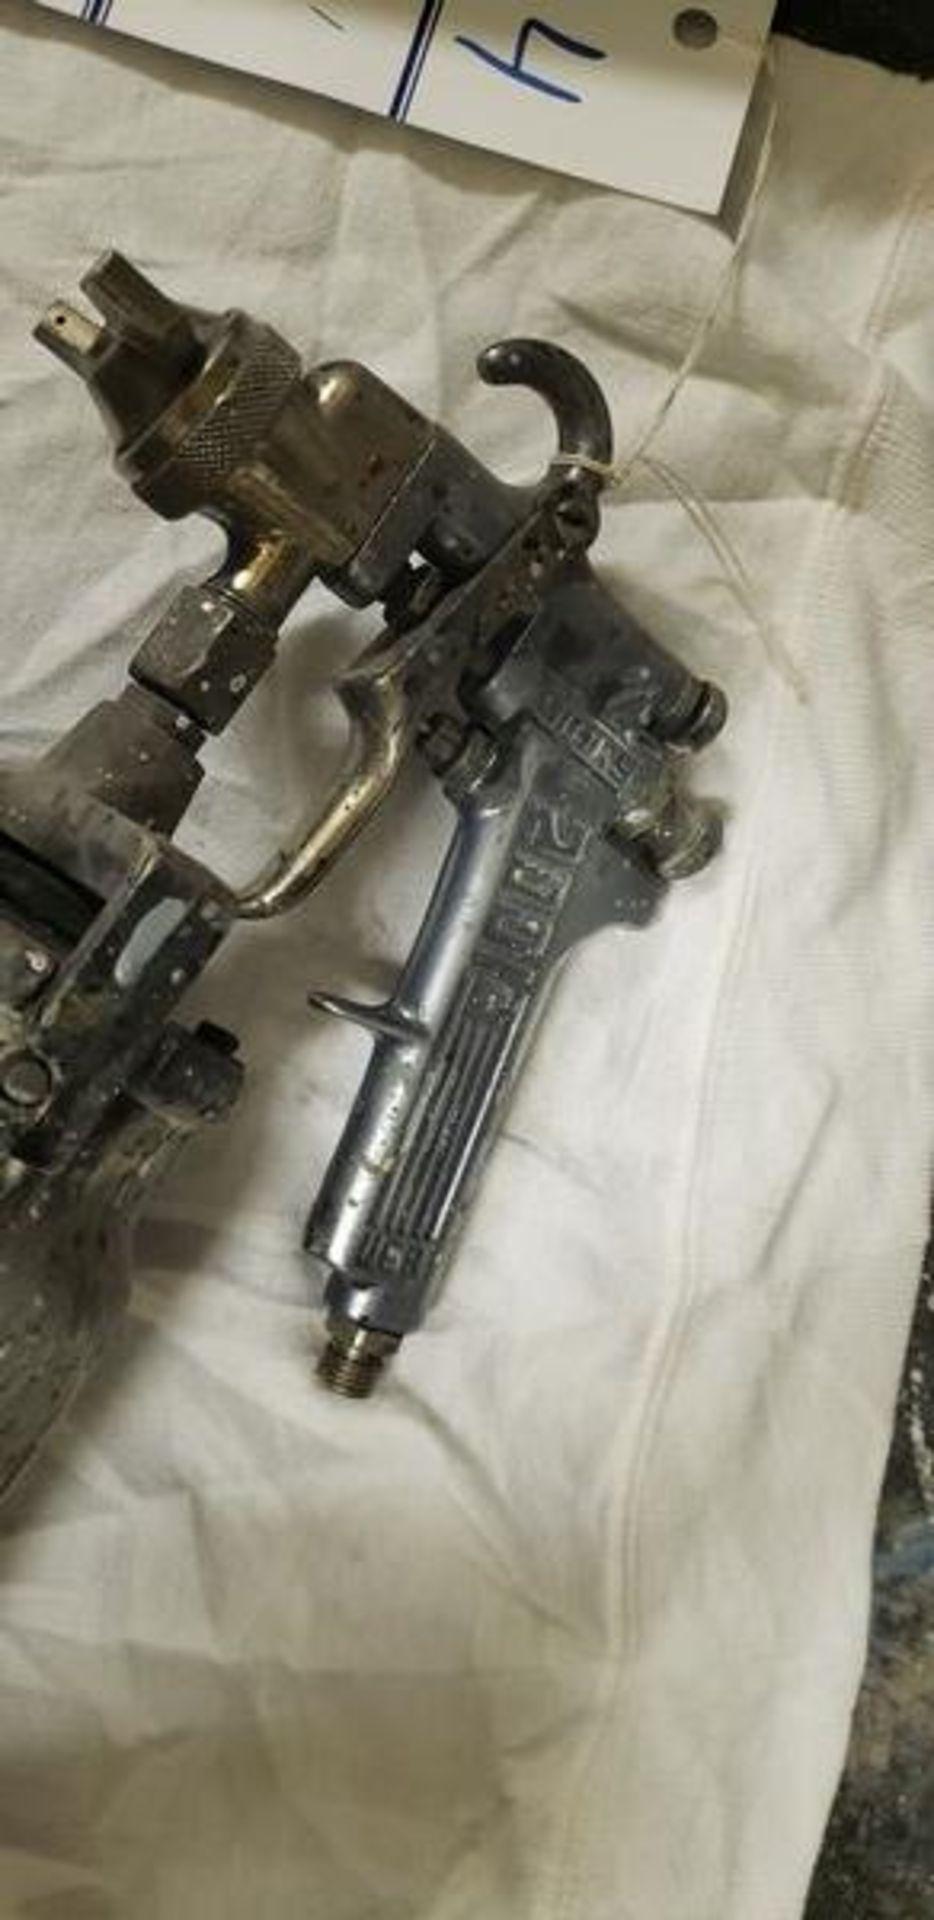 BINKS 2001 SPRAY GUN - Image 2 of 4